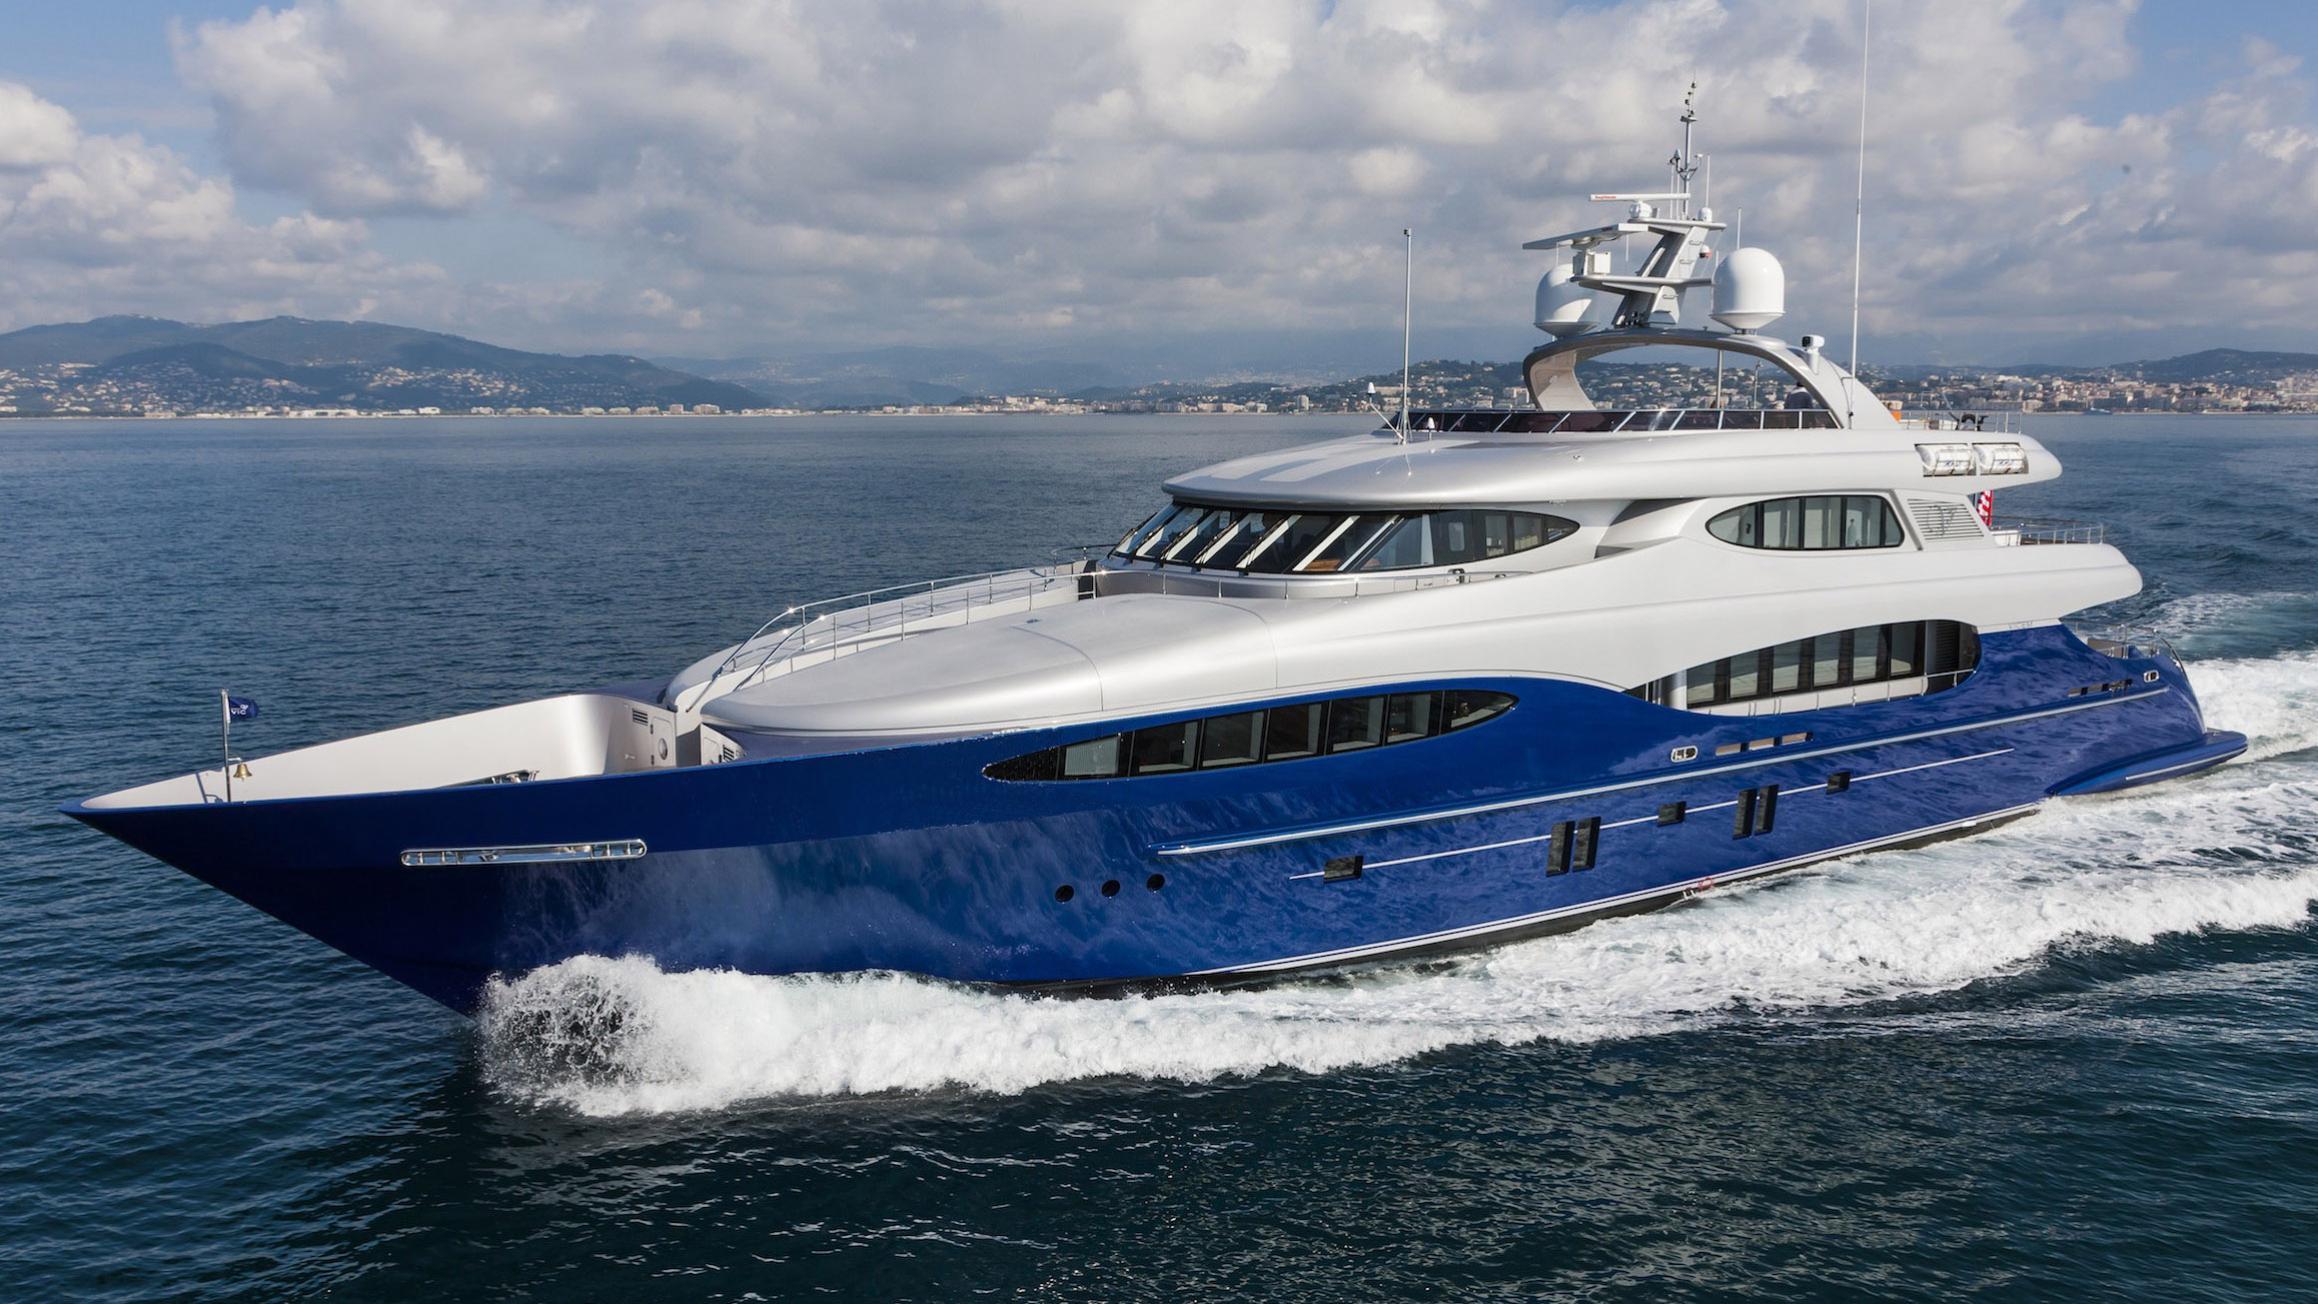 vicem-yacht-for-sale-profile